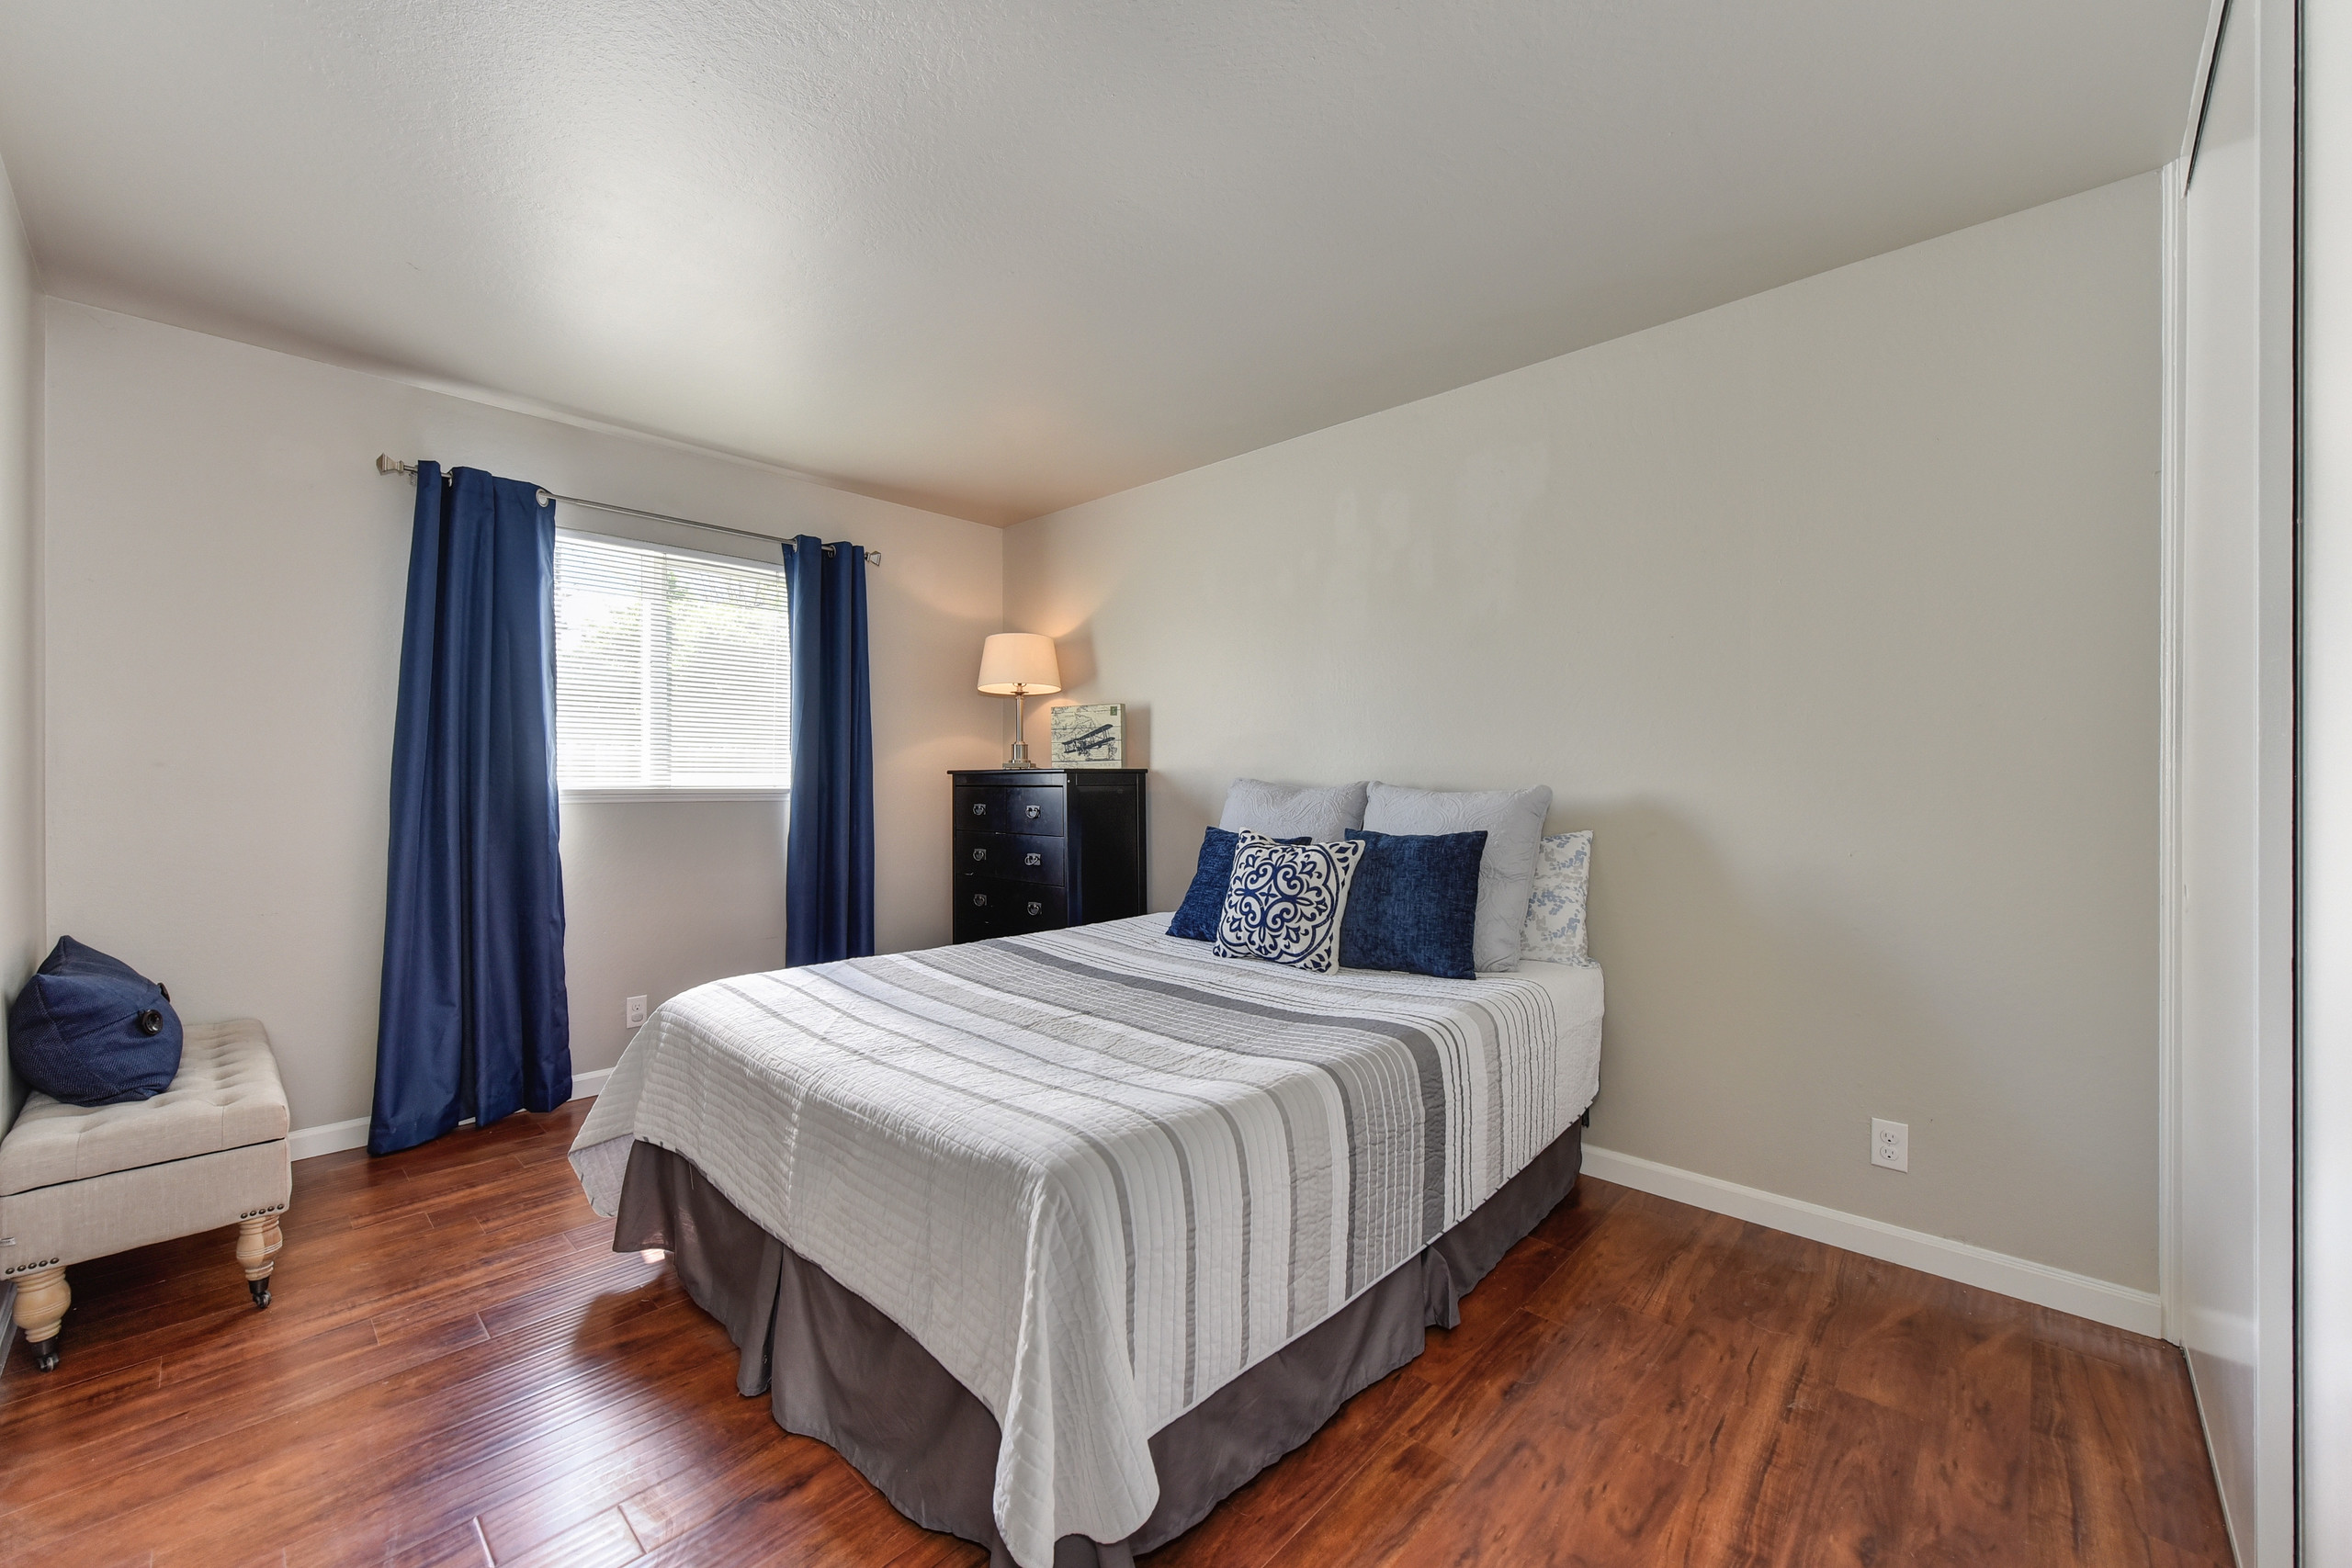 2208 Alegre Court Rancho Cordova CA 95670 ,Bedroom 2